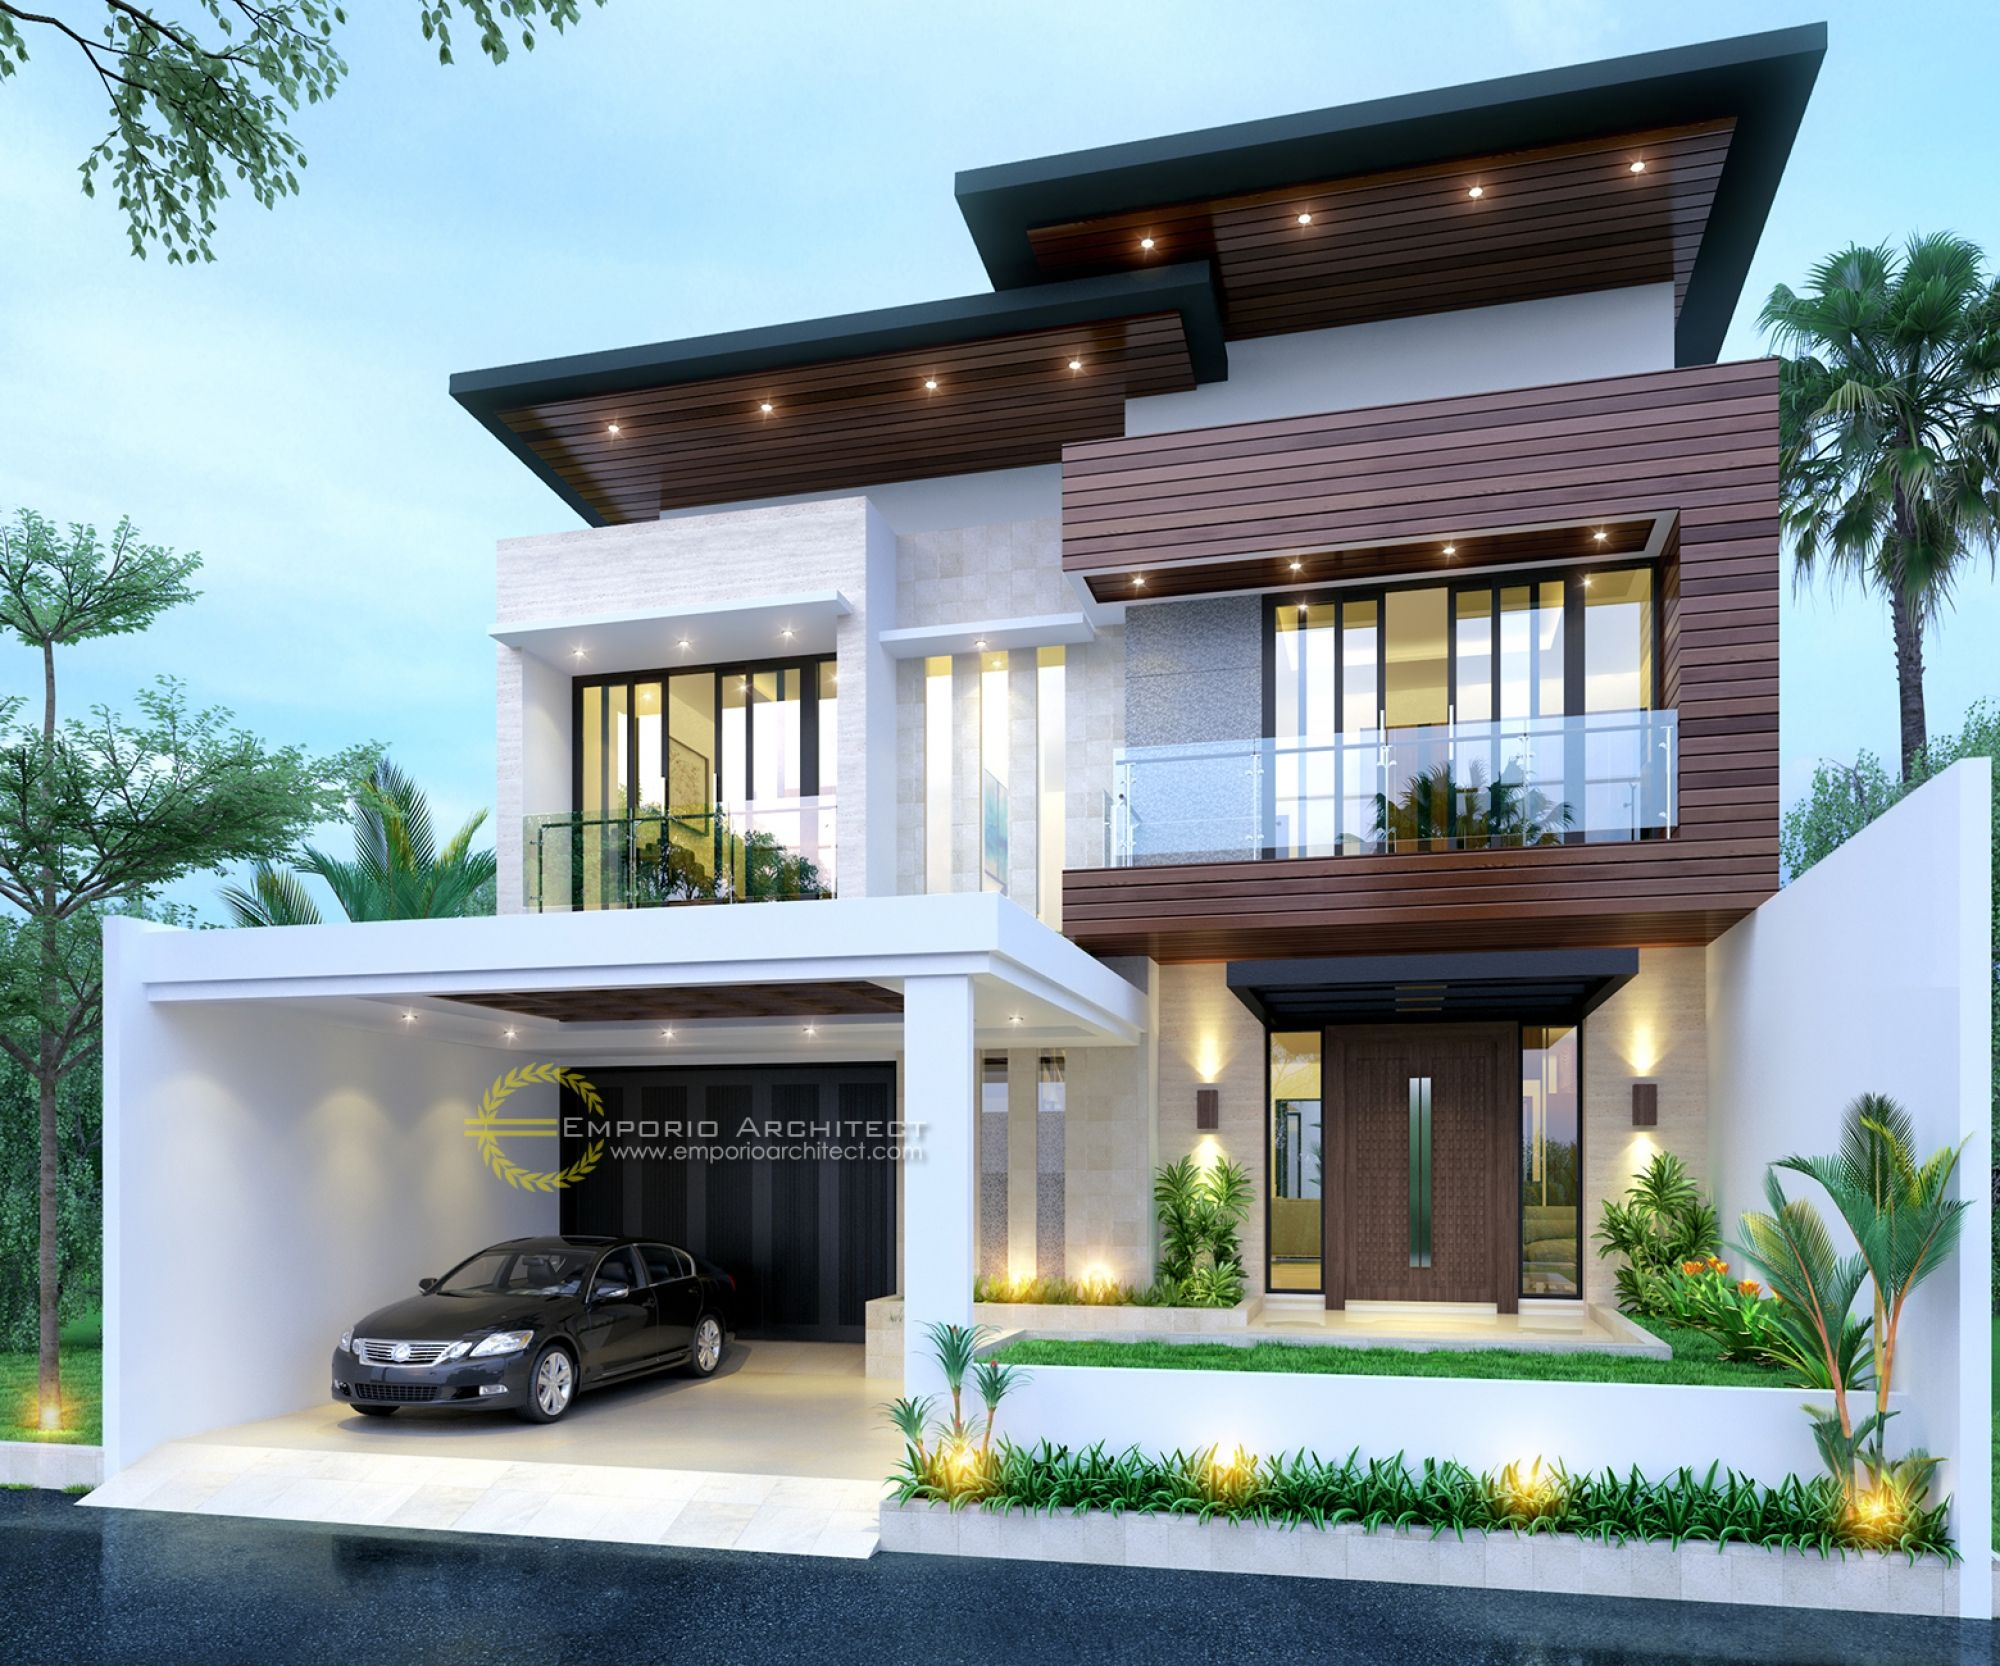 Jasa arsitek desain rumah ibu anisa modern house plans design blueprints also ultra home designs  in rh pinterest